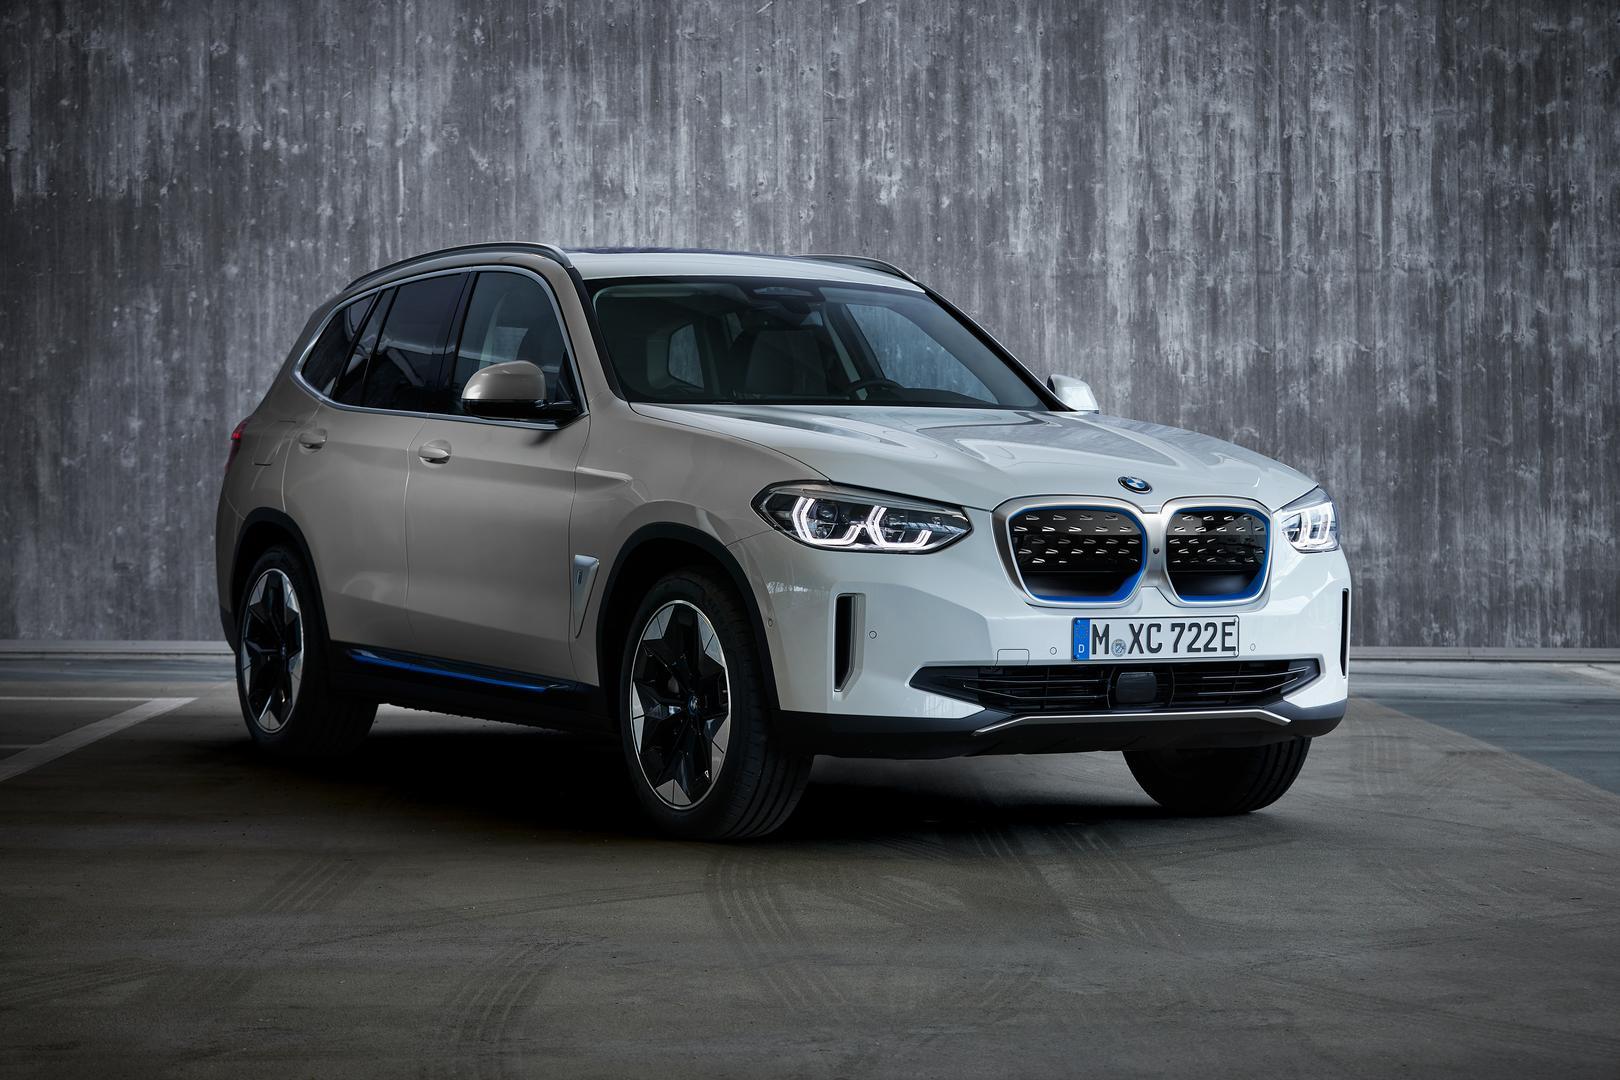 White BMW iX3